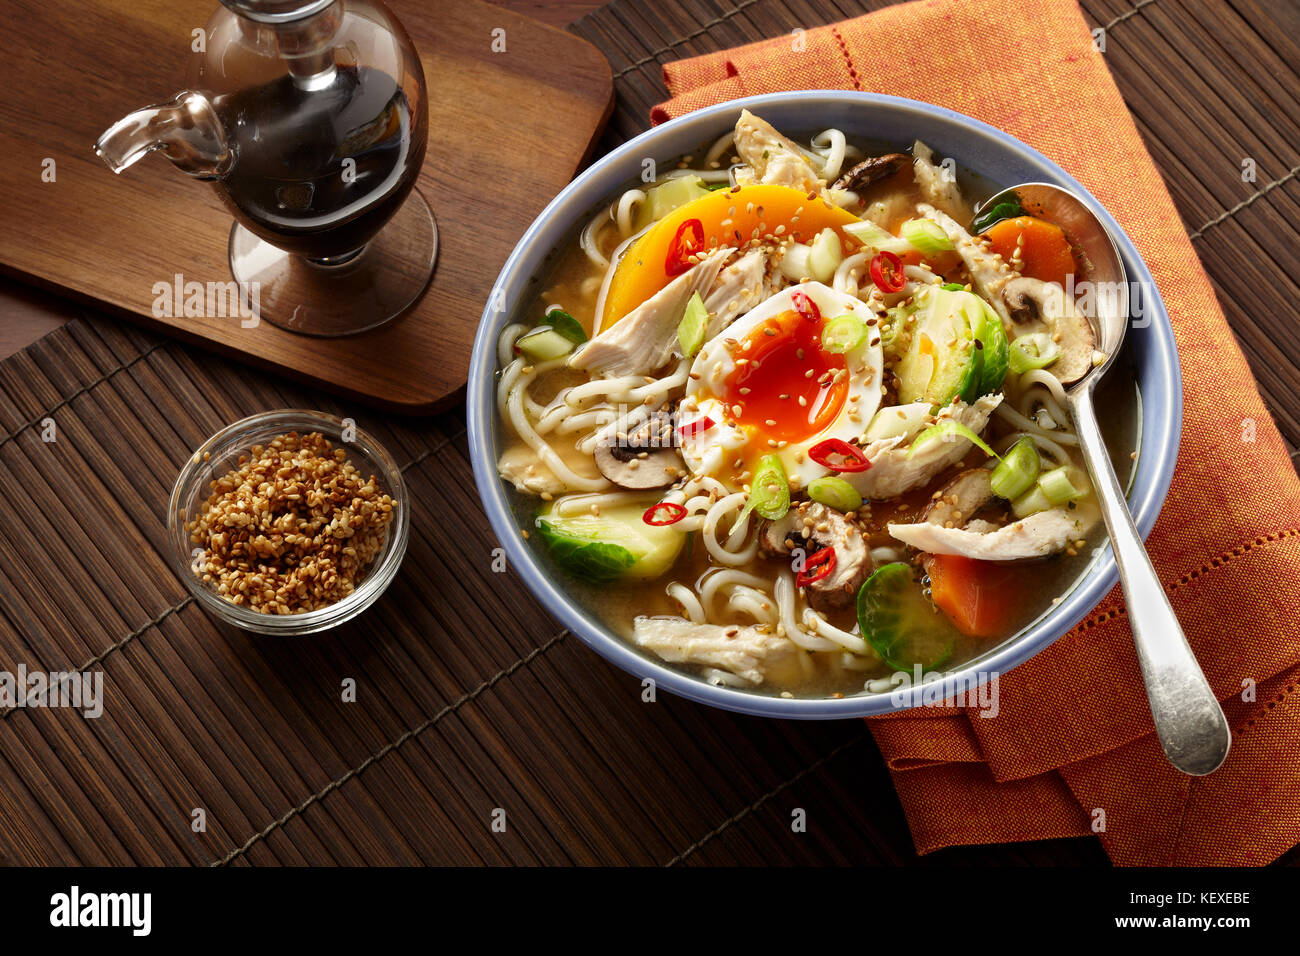 Turkey ramen - Stock Image